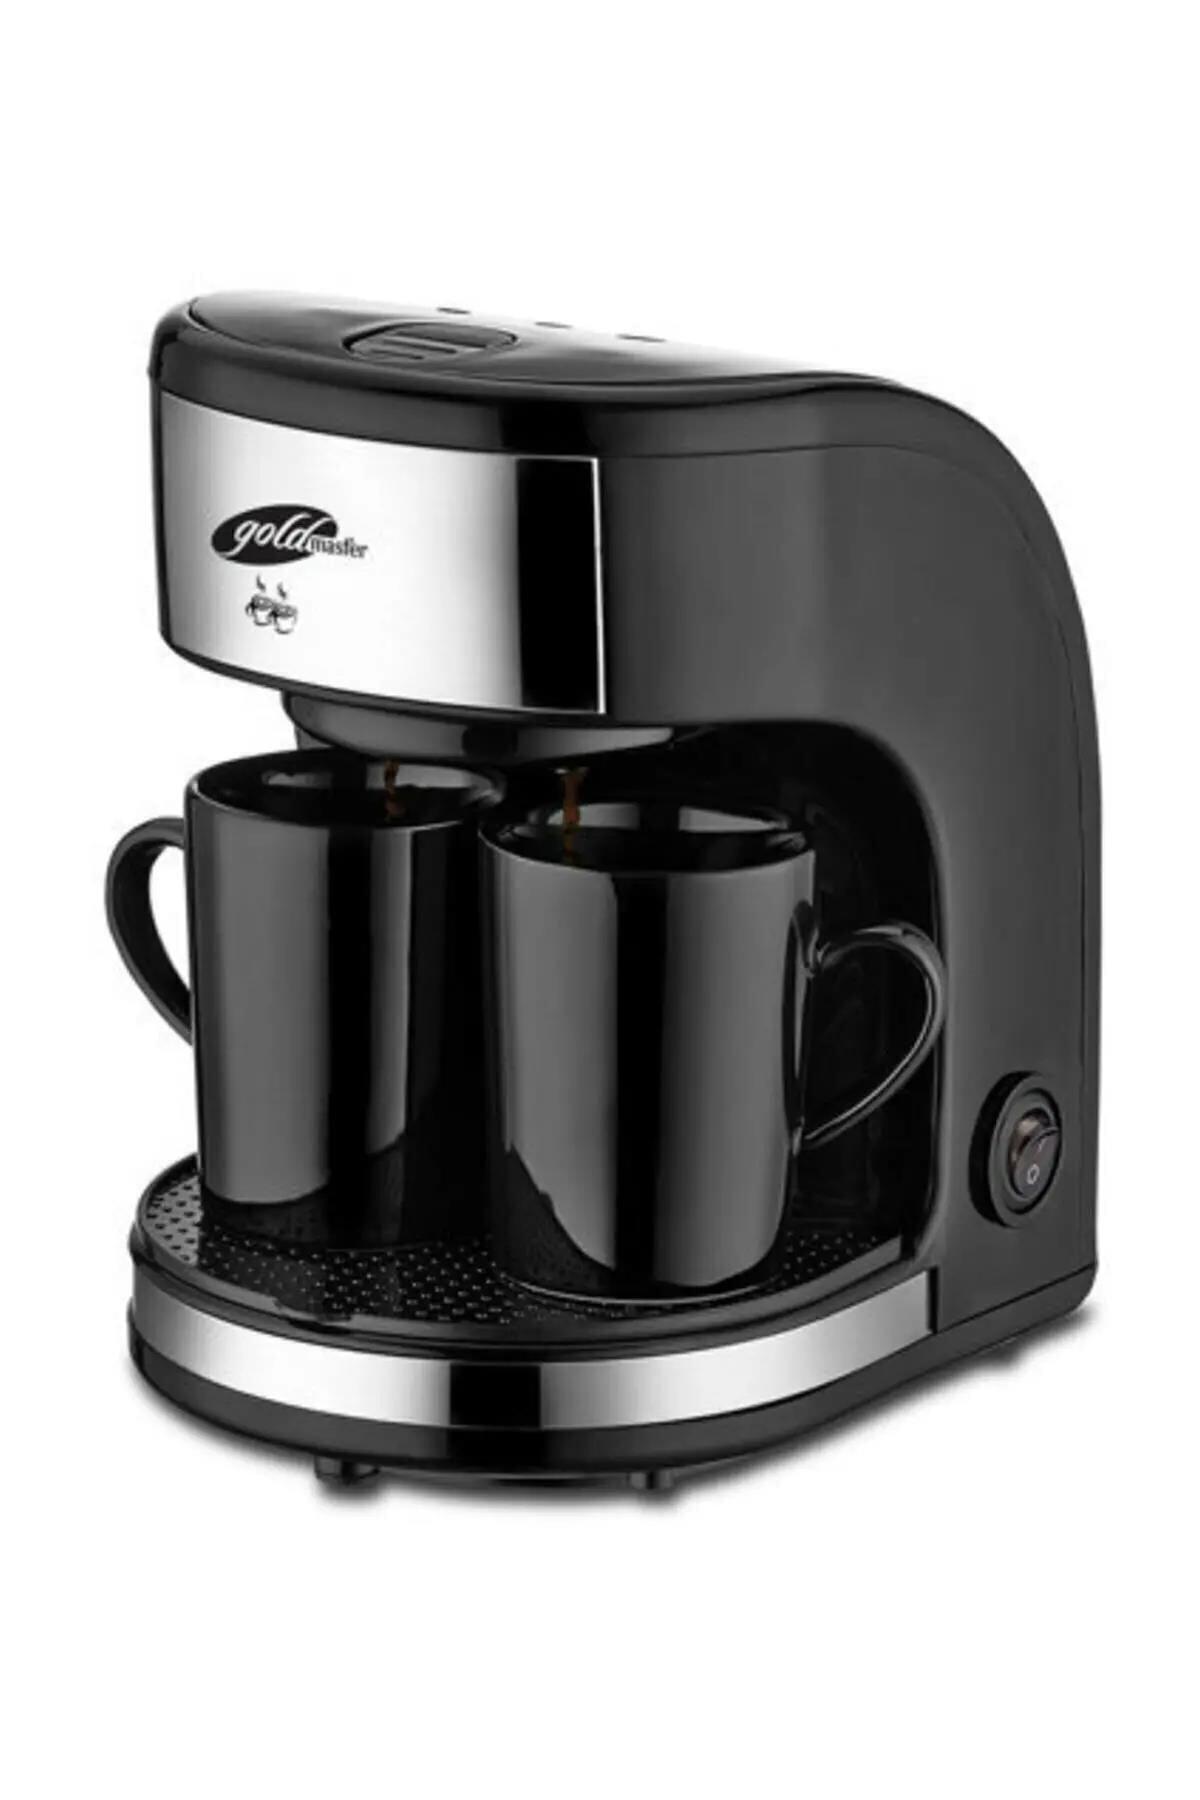 GOLDMASTER Gm-7331 Zinde Filtre Kahve Makinesi 1